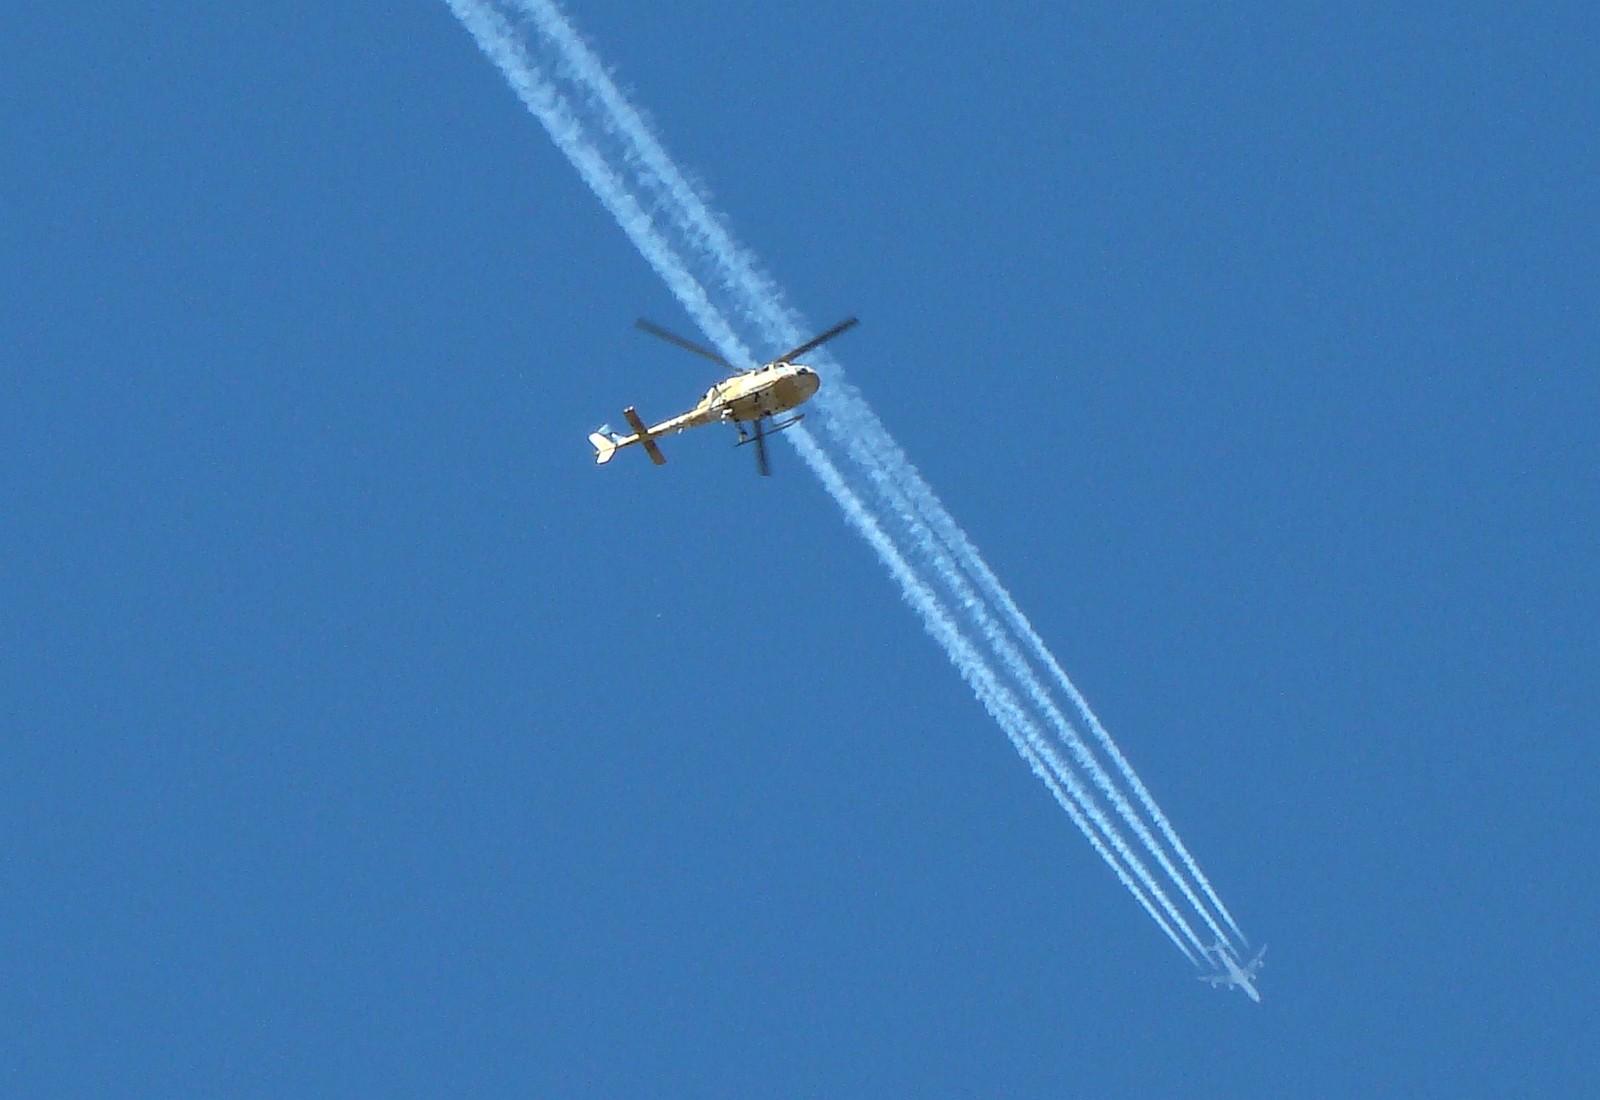 صور مروحيات القوات الجوية الجزائرية Ecureuil/Fennec ] AS-355N2 / AS-555N ] - صفحة 4 3558731105_9baef483a7_o